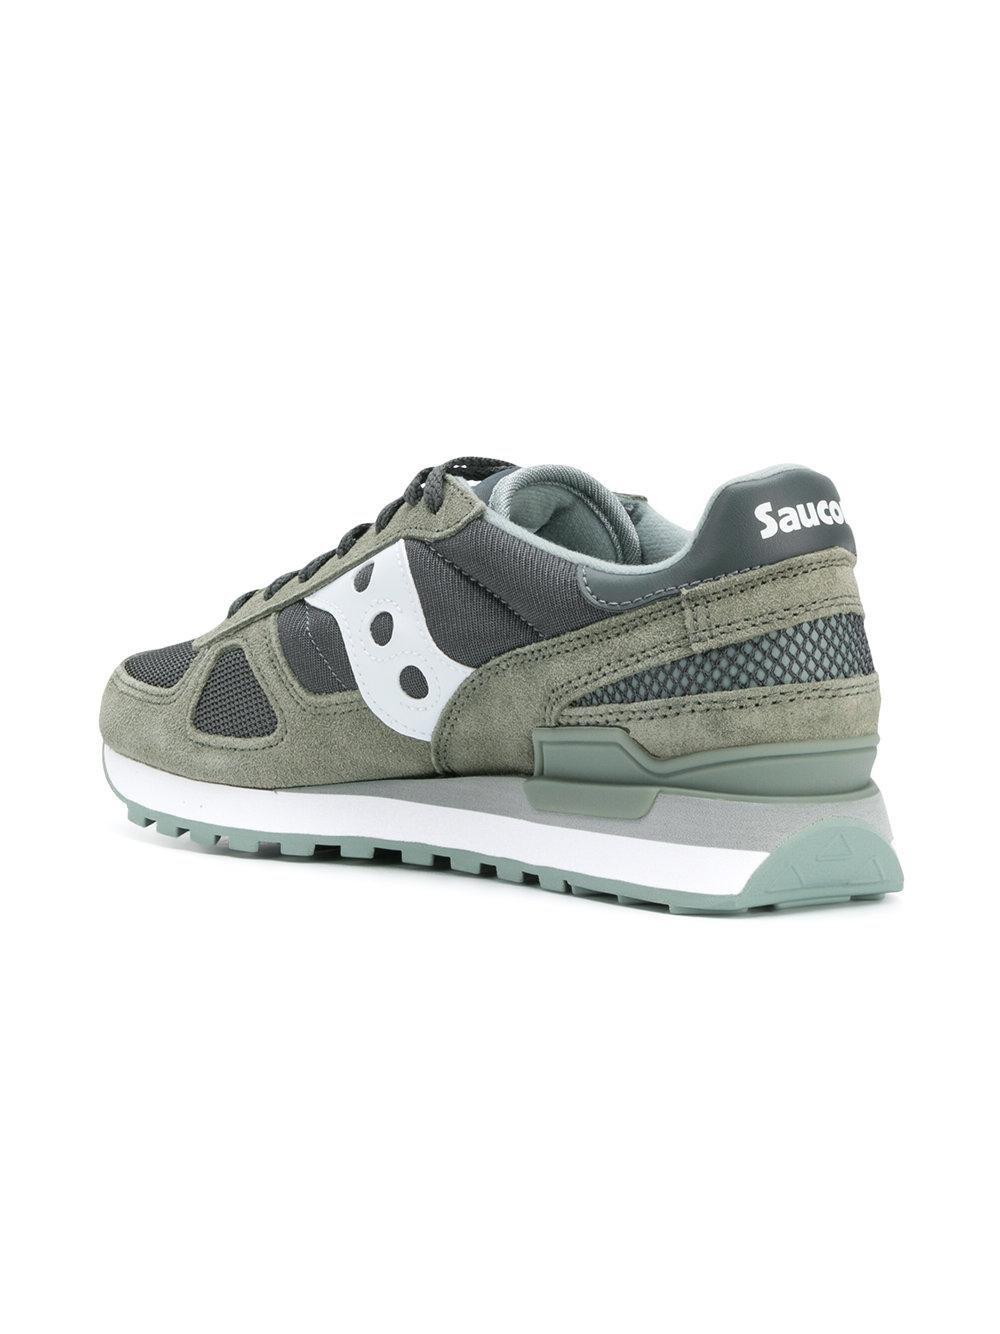 panelled runner sneakers - Green Saucony FchIA65